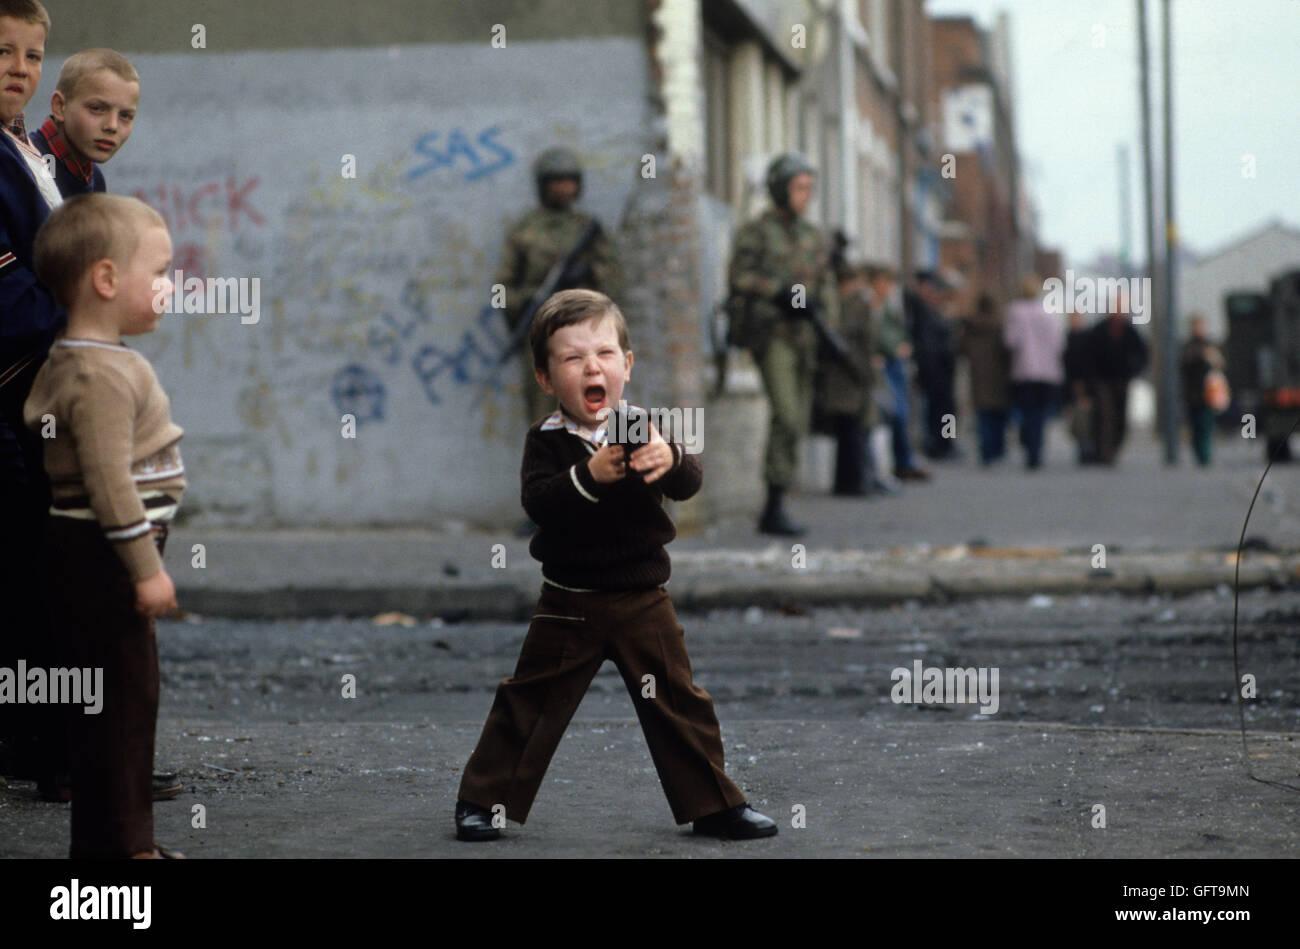 Kinder spielen Waffen, 1980er Jahre HOMER SYKES ARCHIV Stockbild